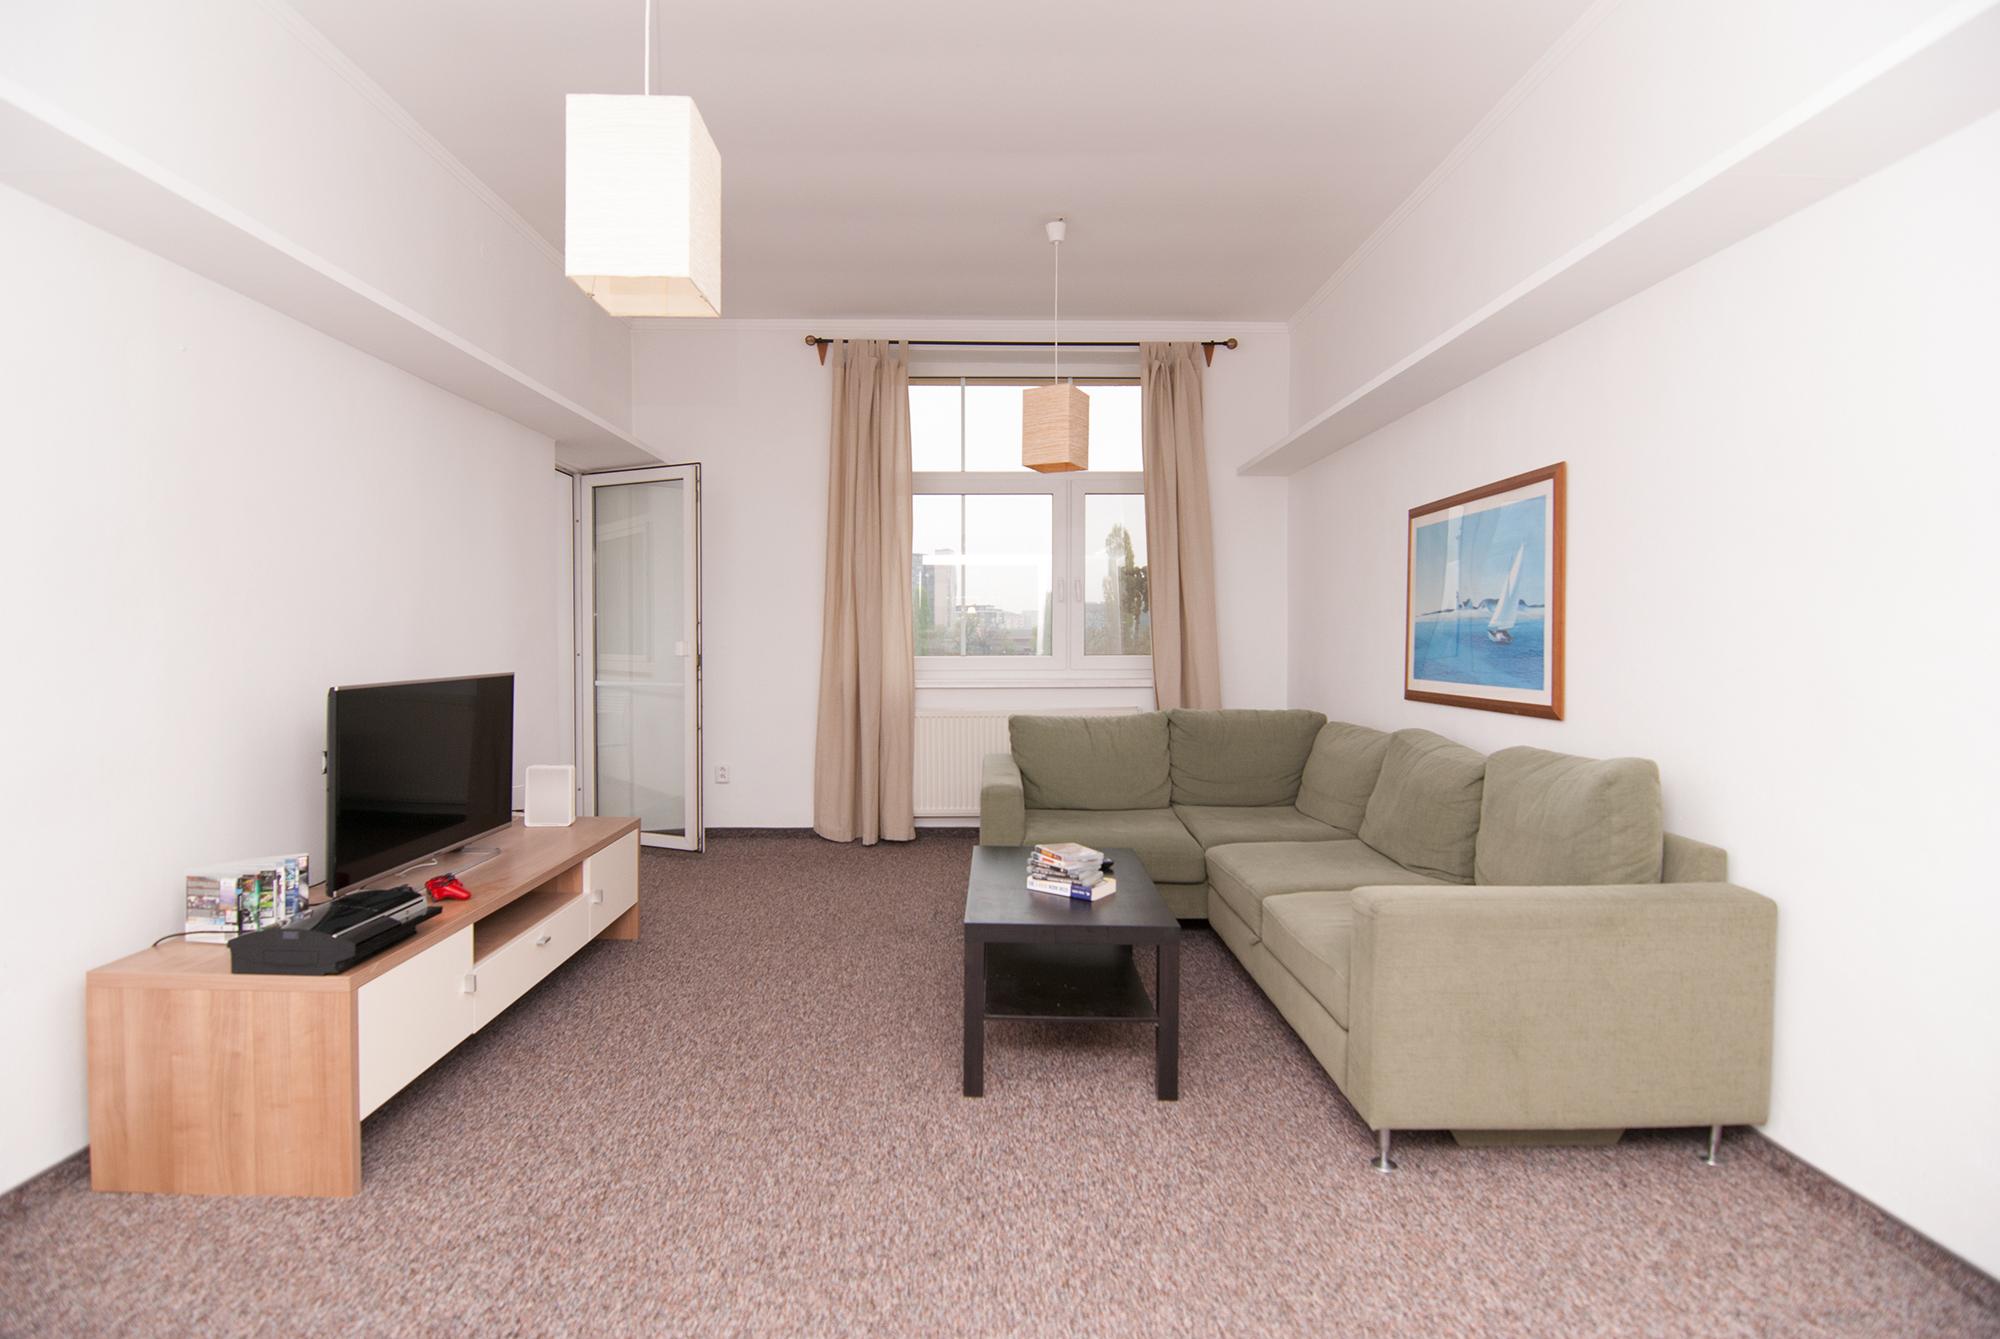 Byt, 3 - izbový, 109m2, Bratislava III - Nové Mesto, Vajnorská ulica